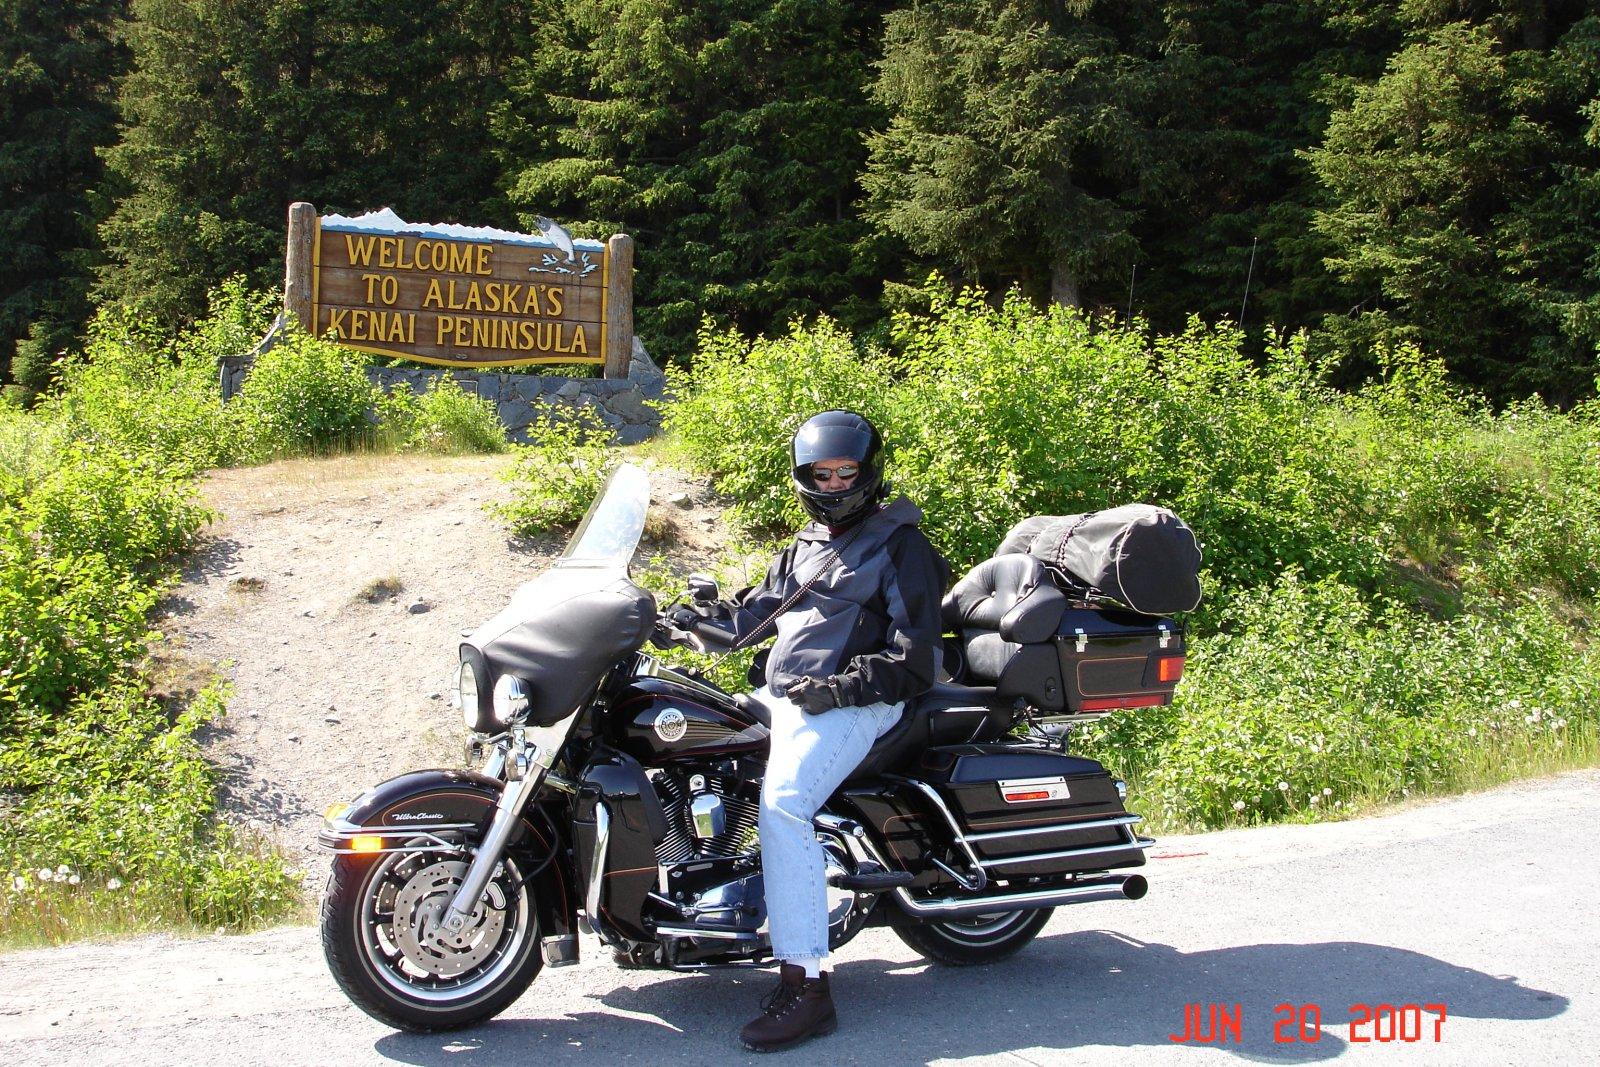 Click image for larger version  Name:Alaska 2007 054.jpg Views:36 Size:619.6 KB ID:88008